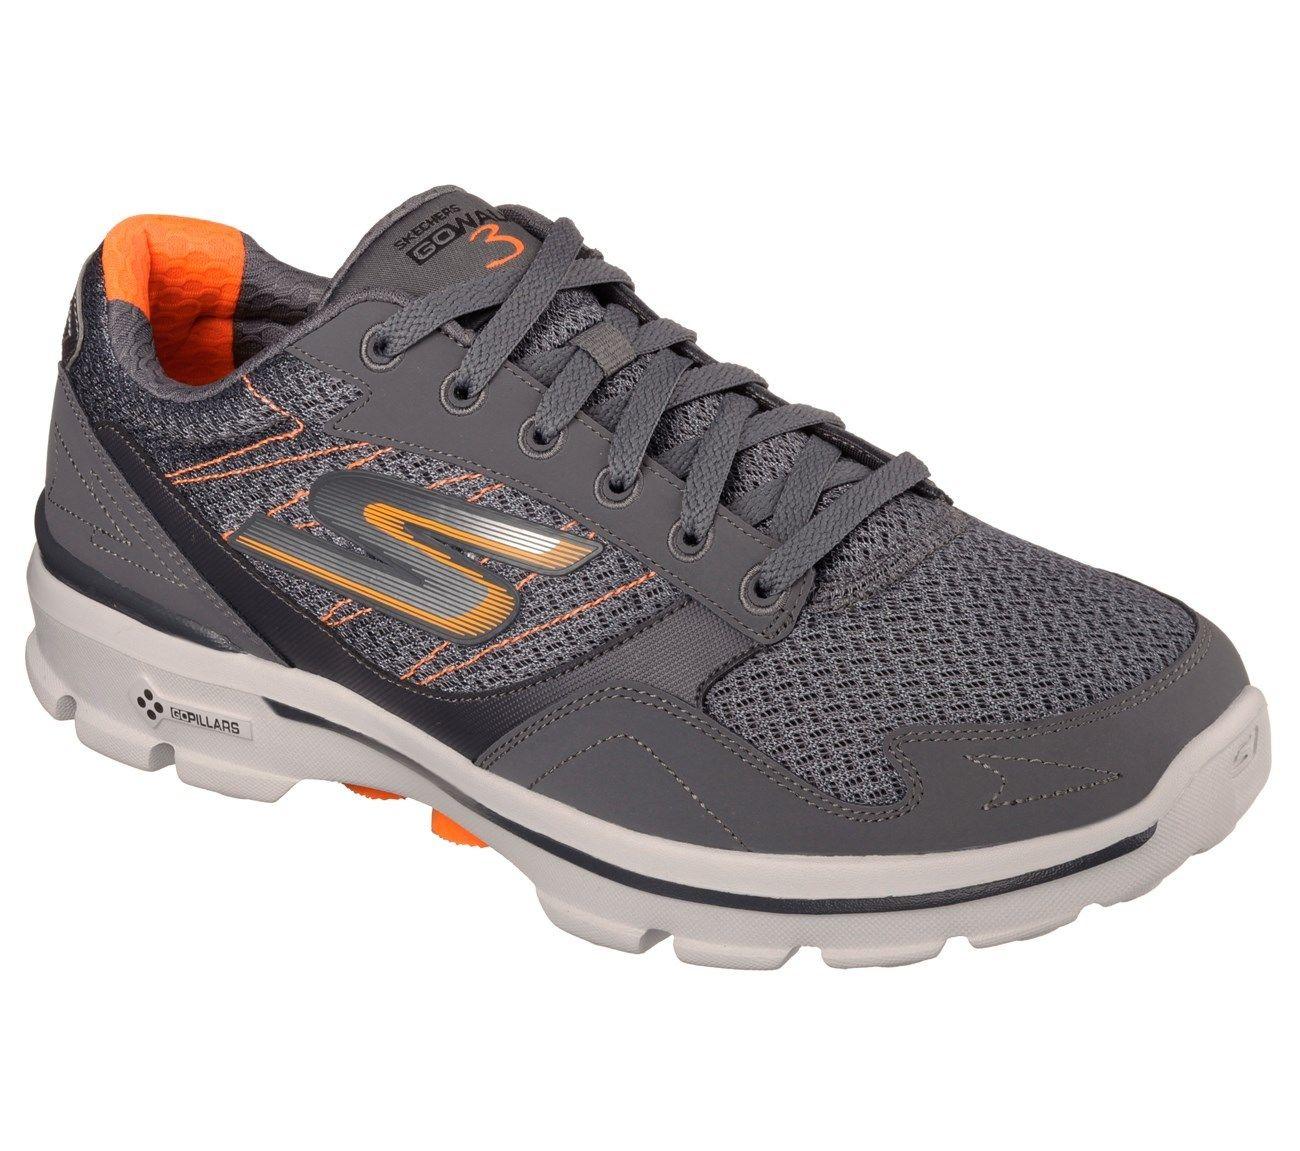 Skechers Gowalk  Compete Men S Walking Shoes